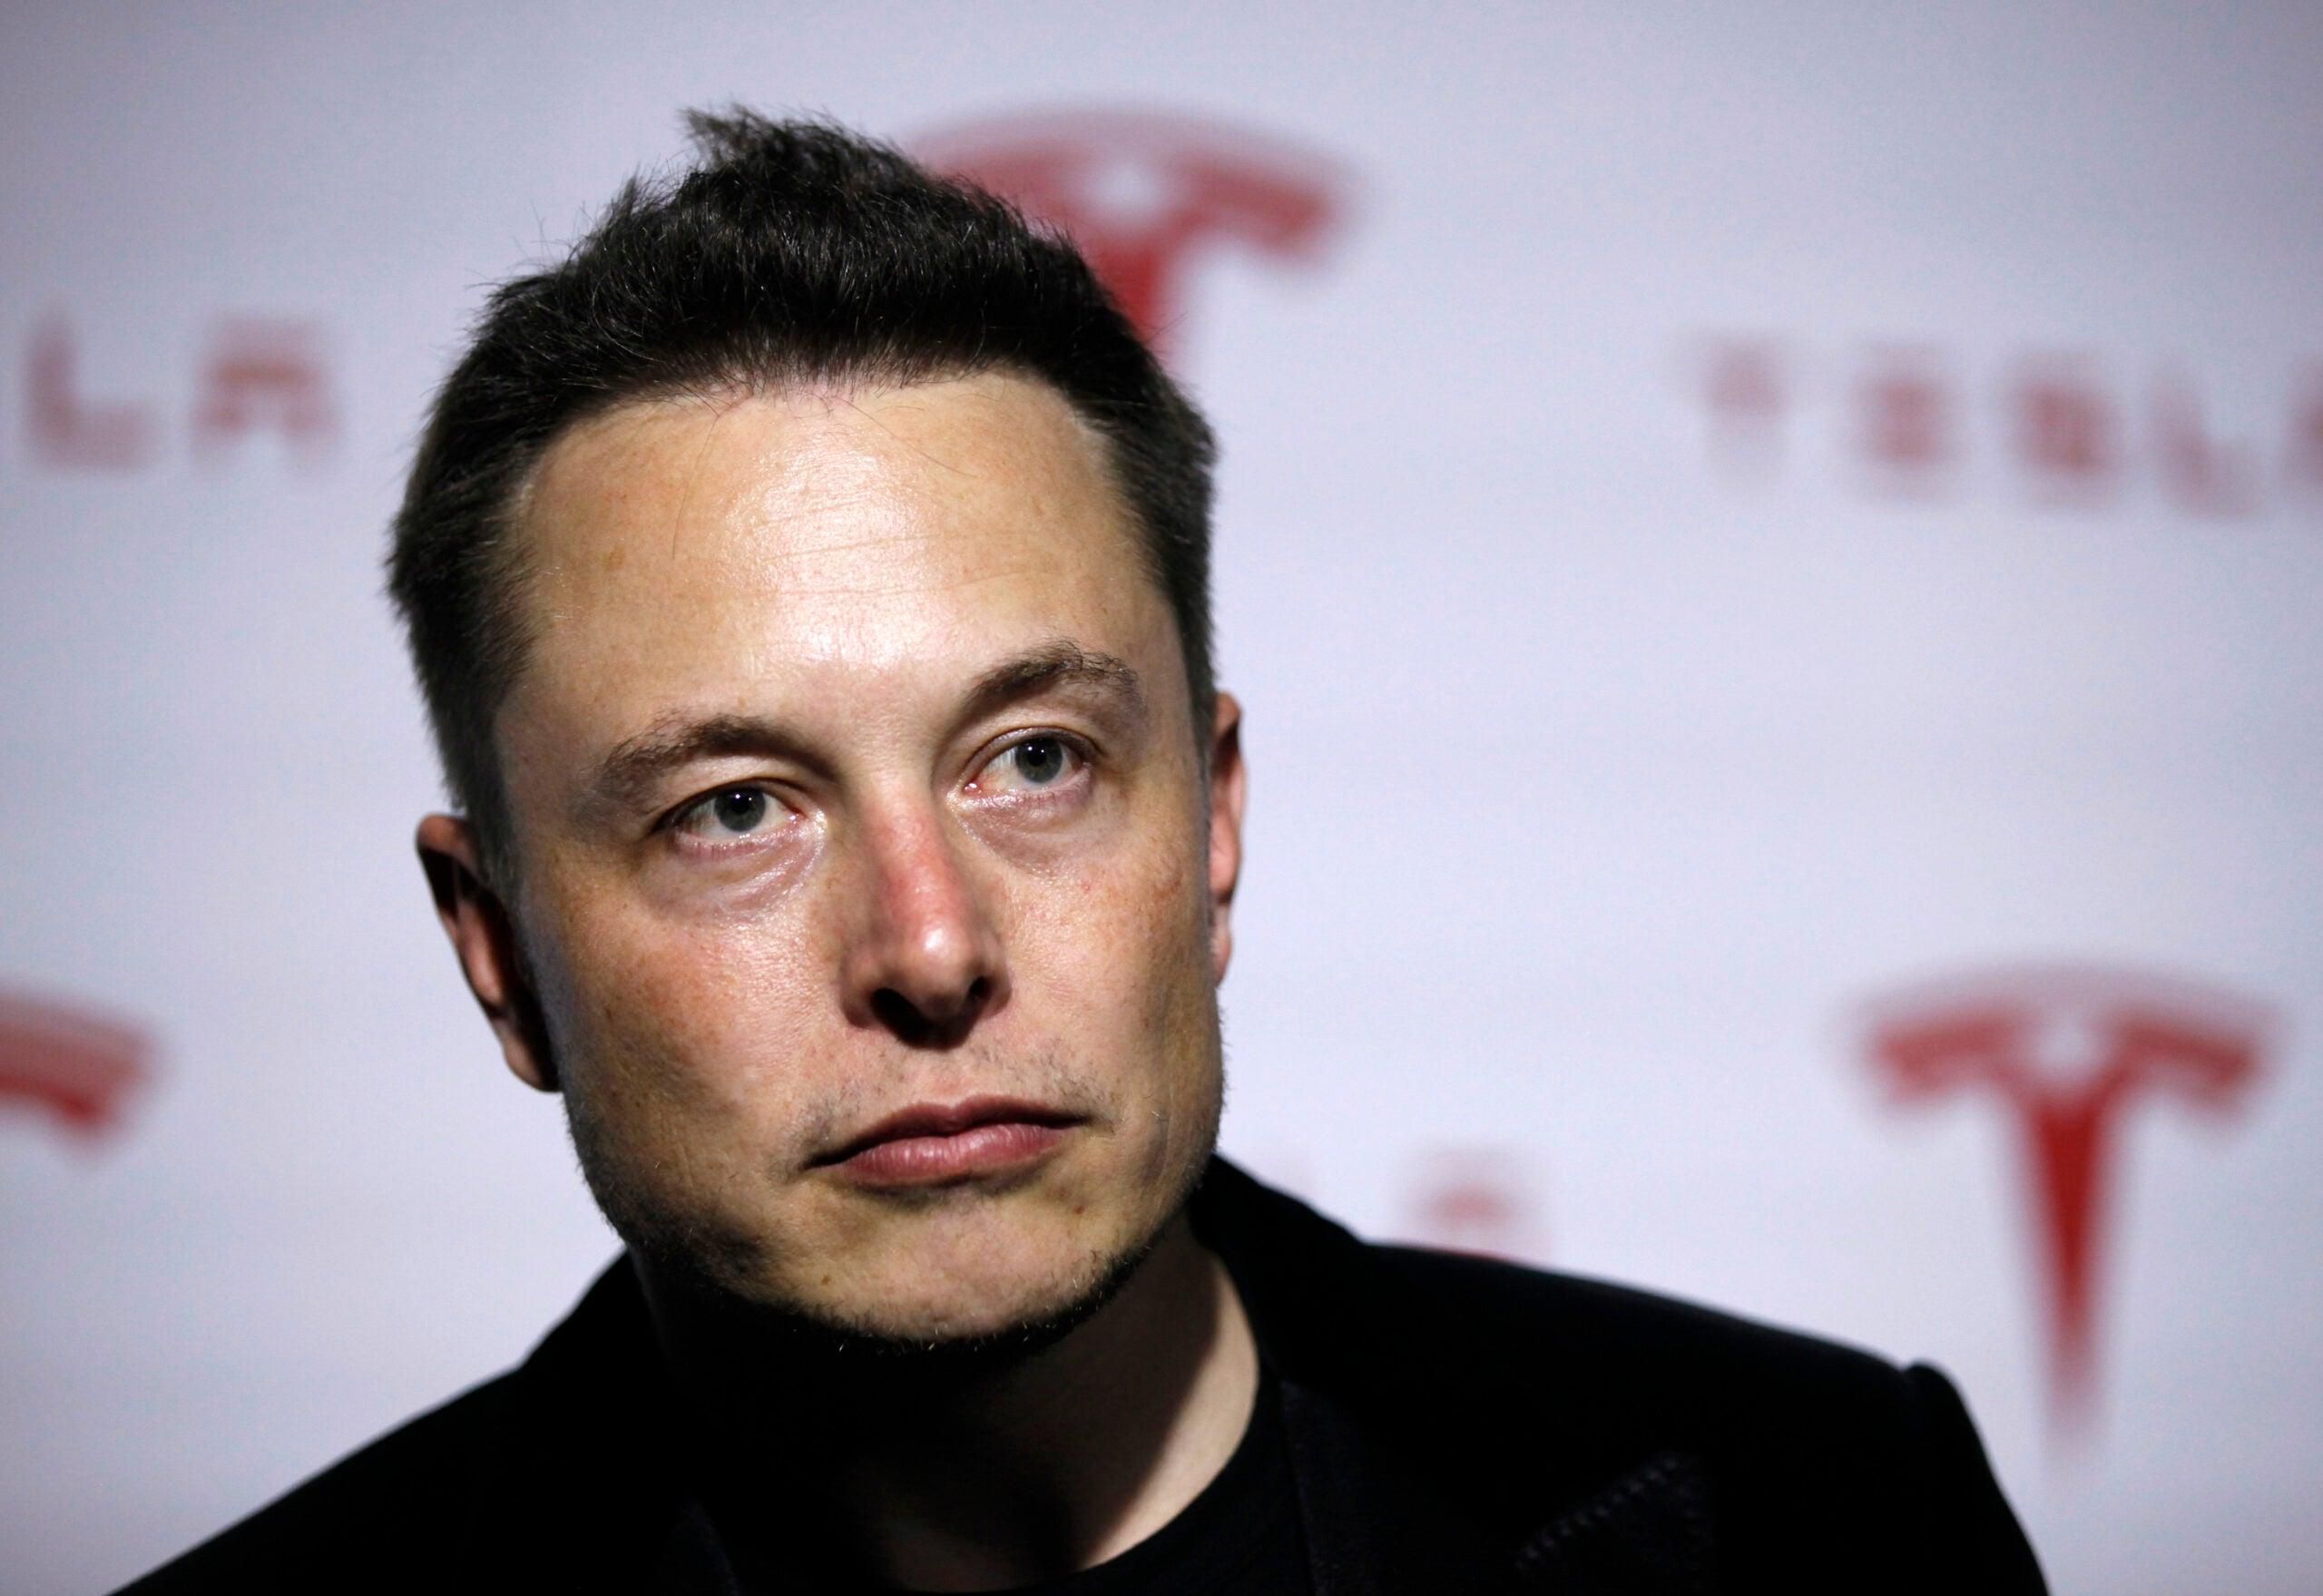 Elon Musk: Our Savior, The Supervillain